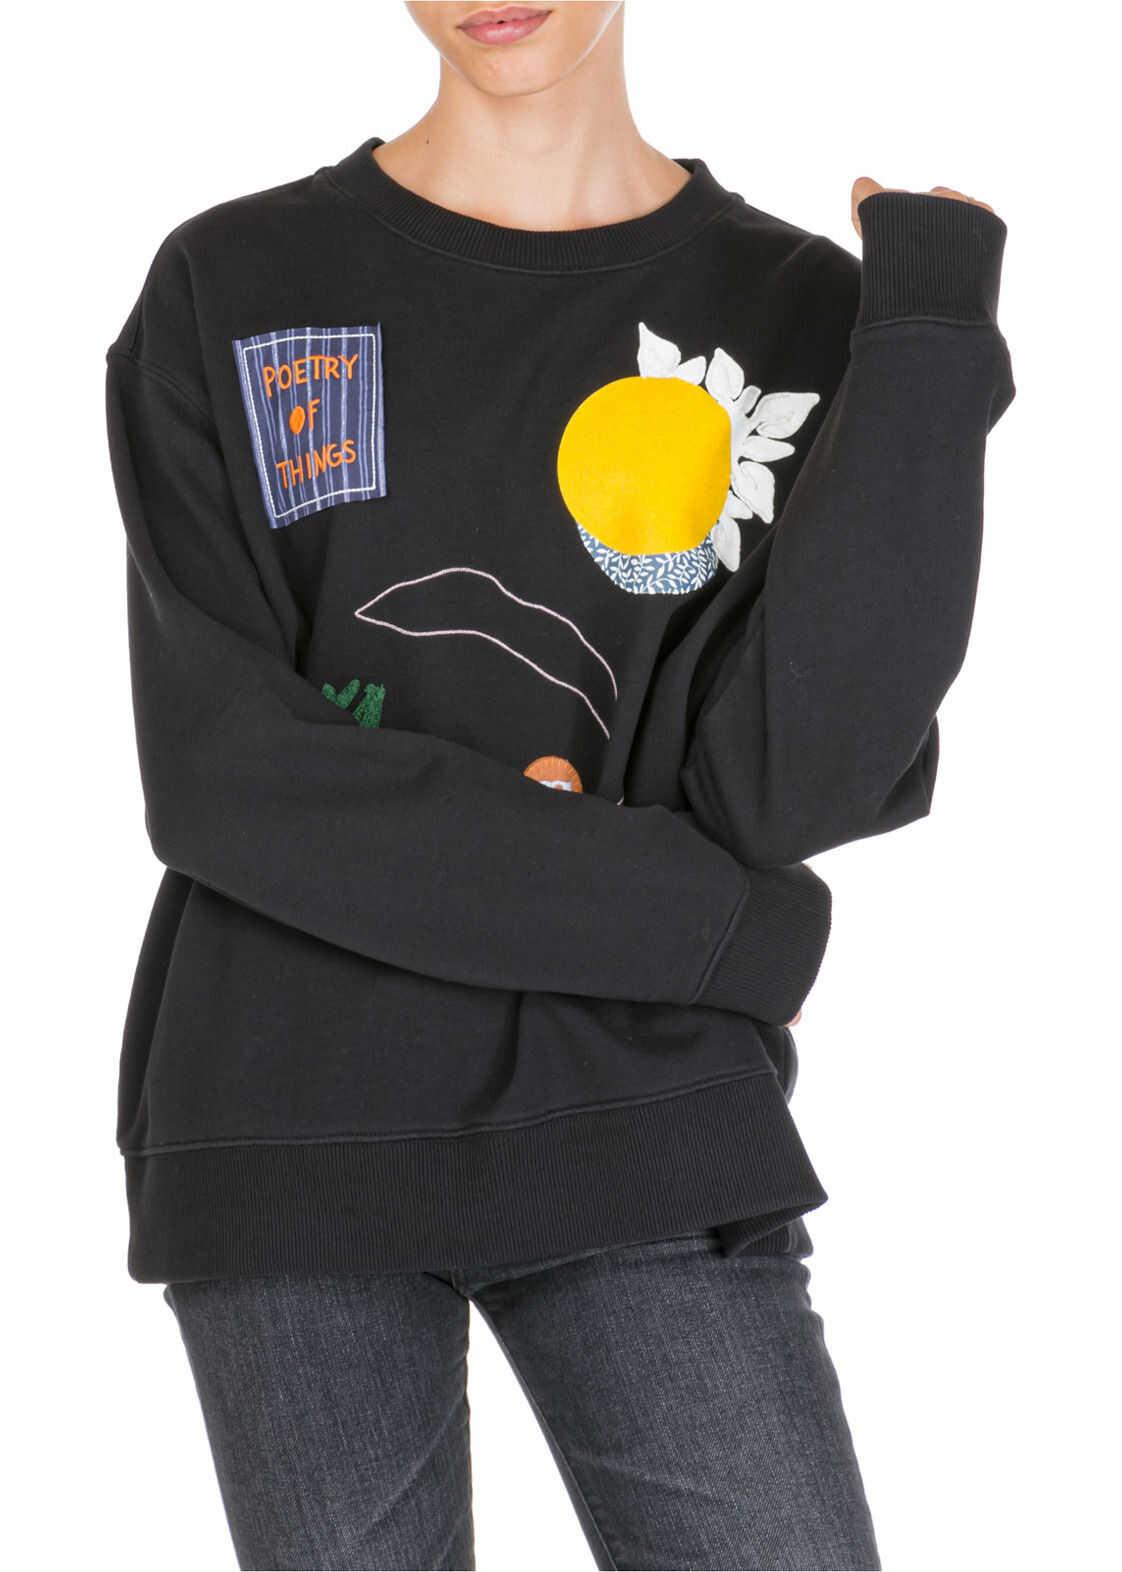 Tory Burch Sweatshirt Black